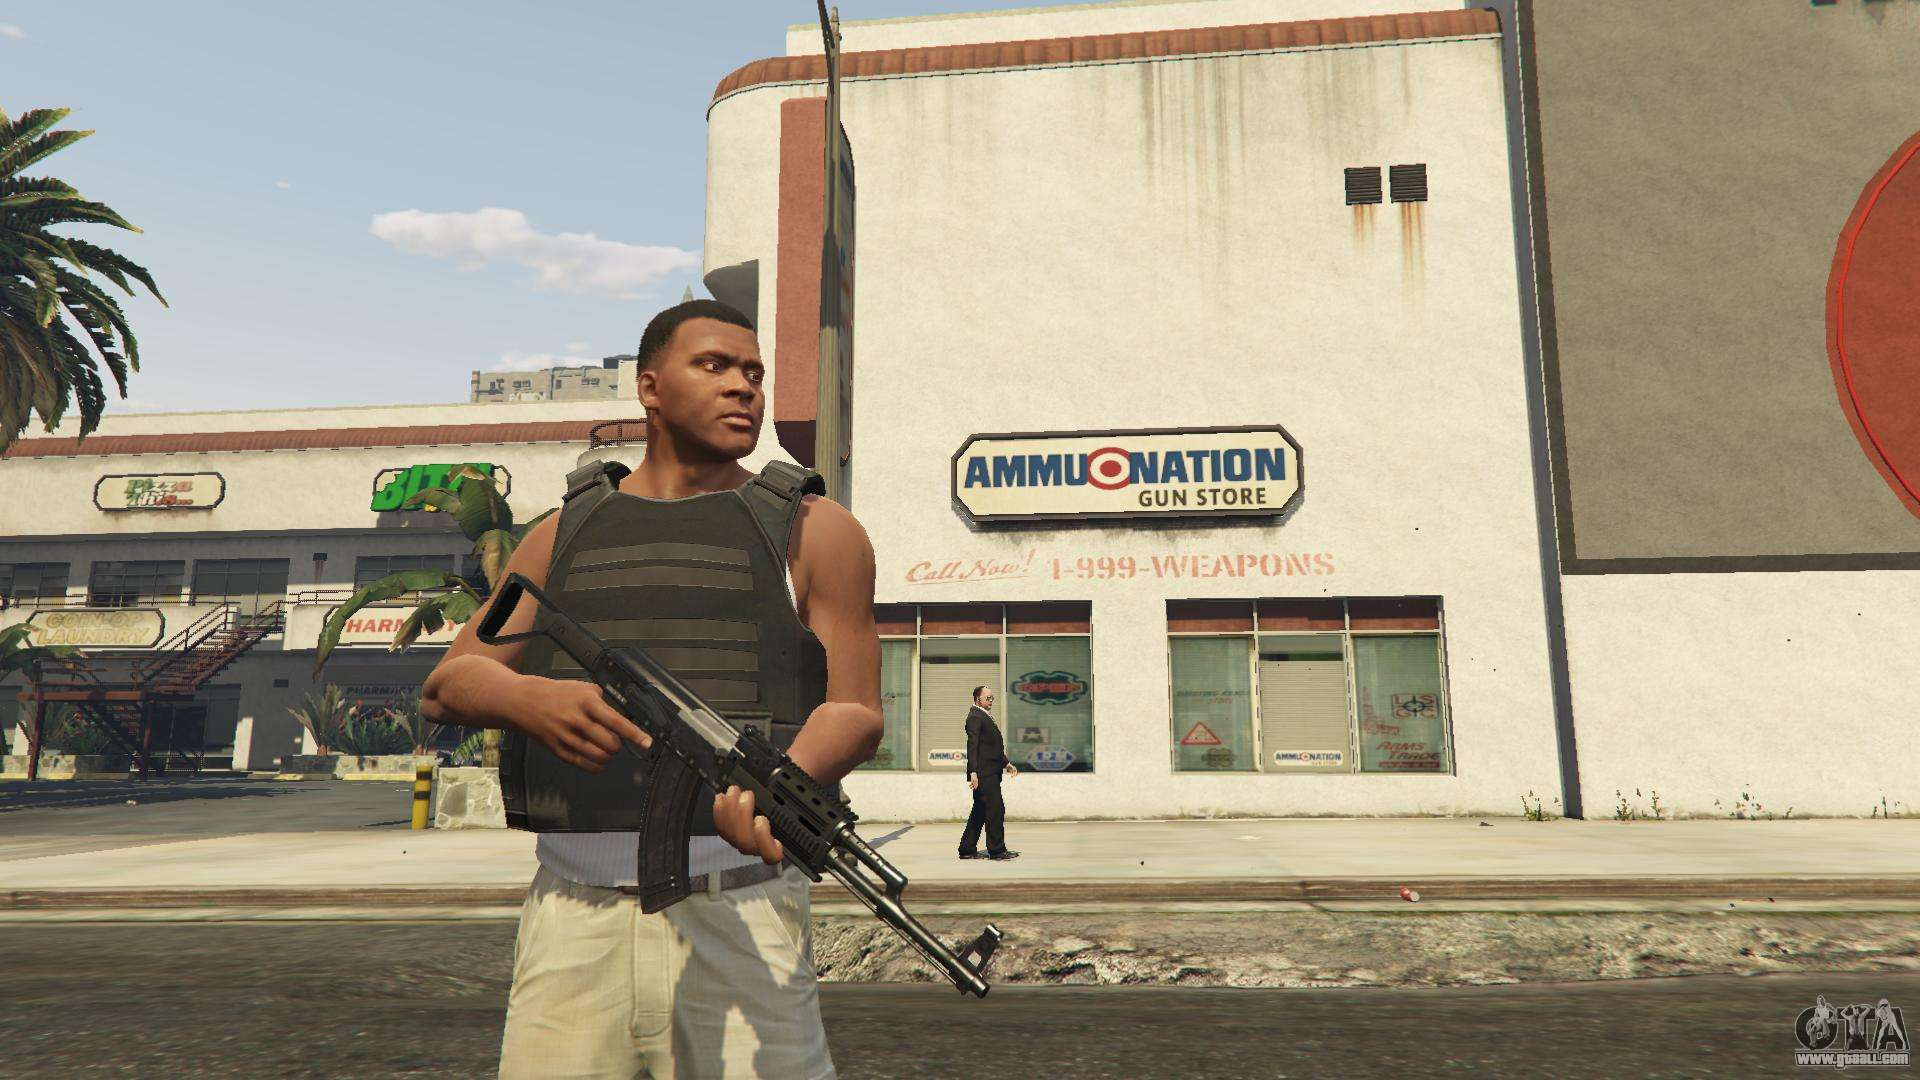 gta 5 gun store not working